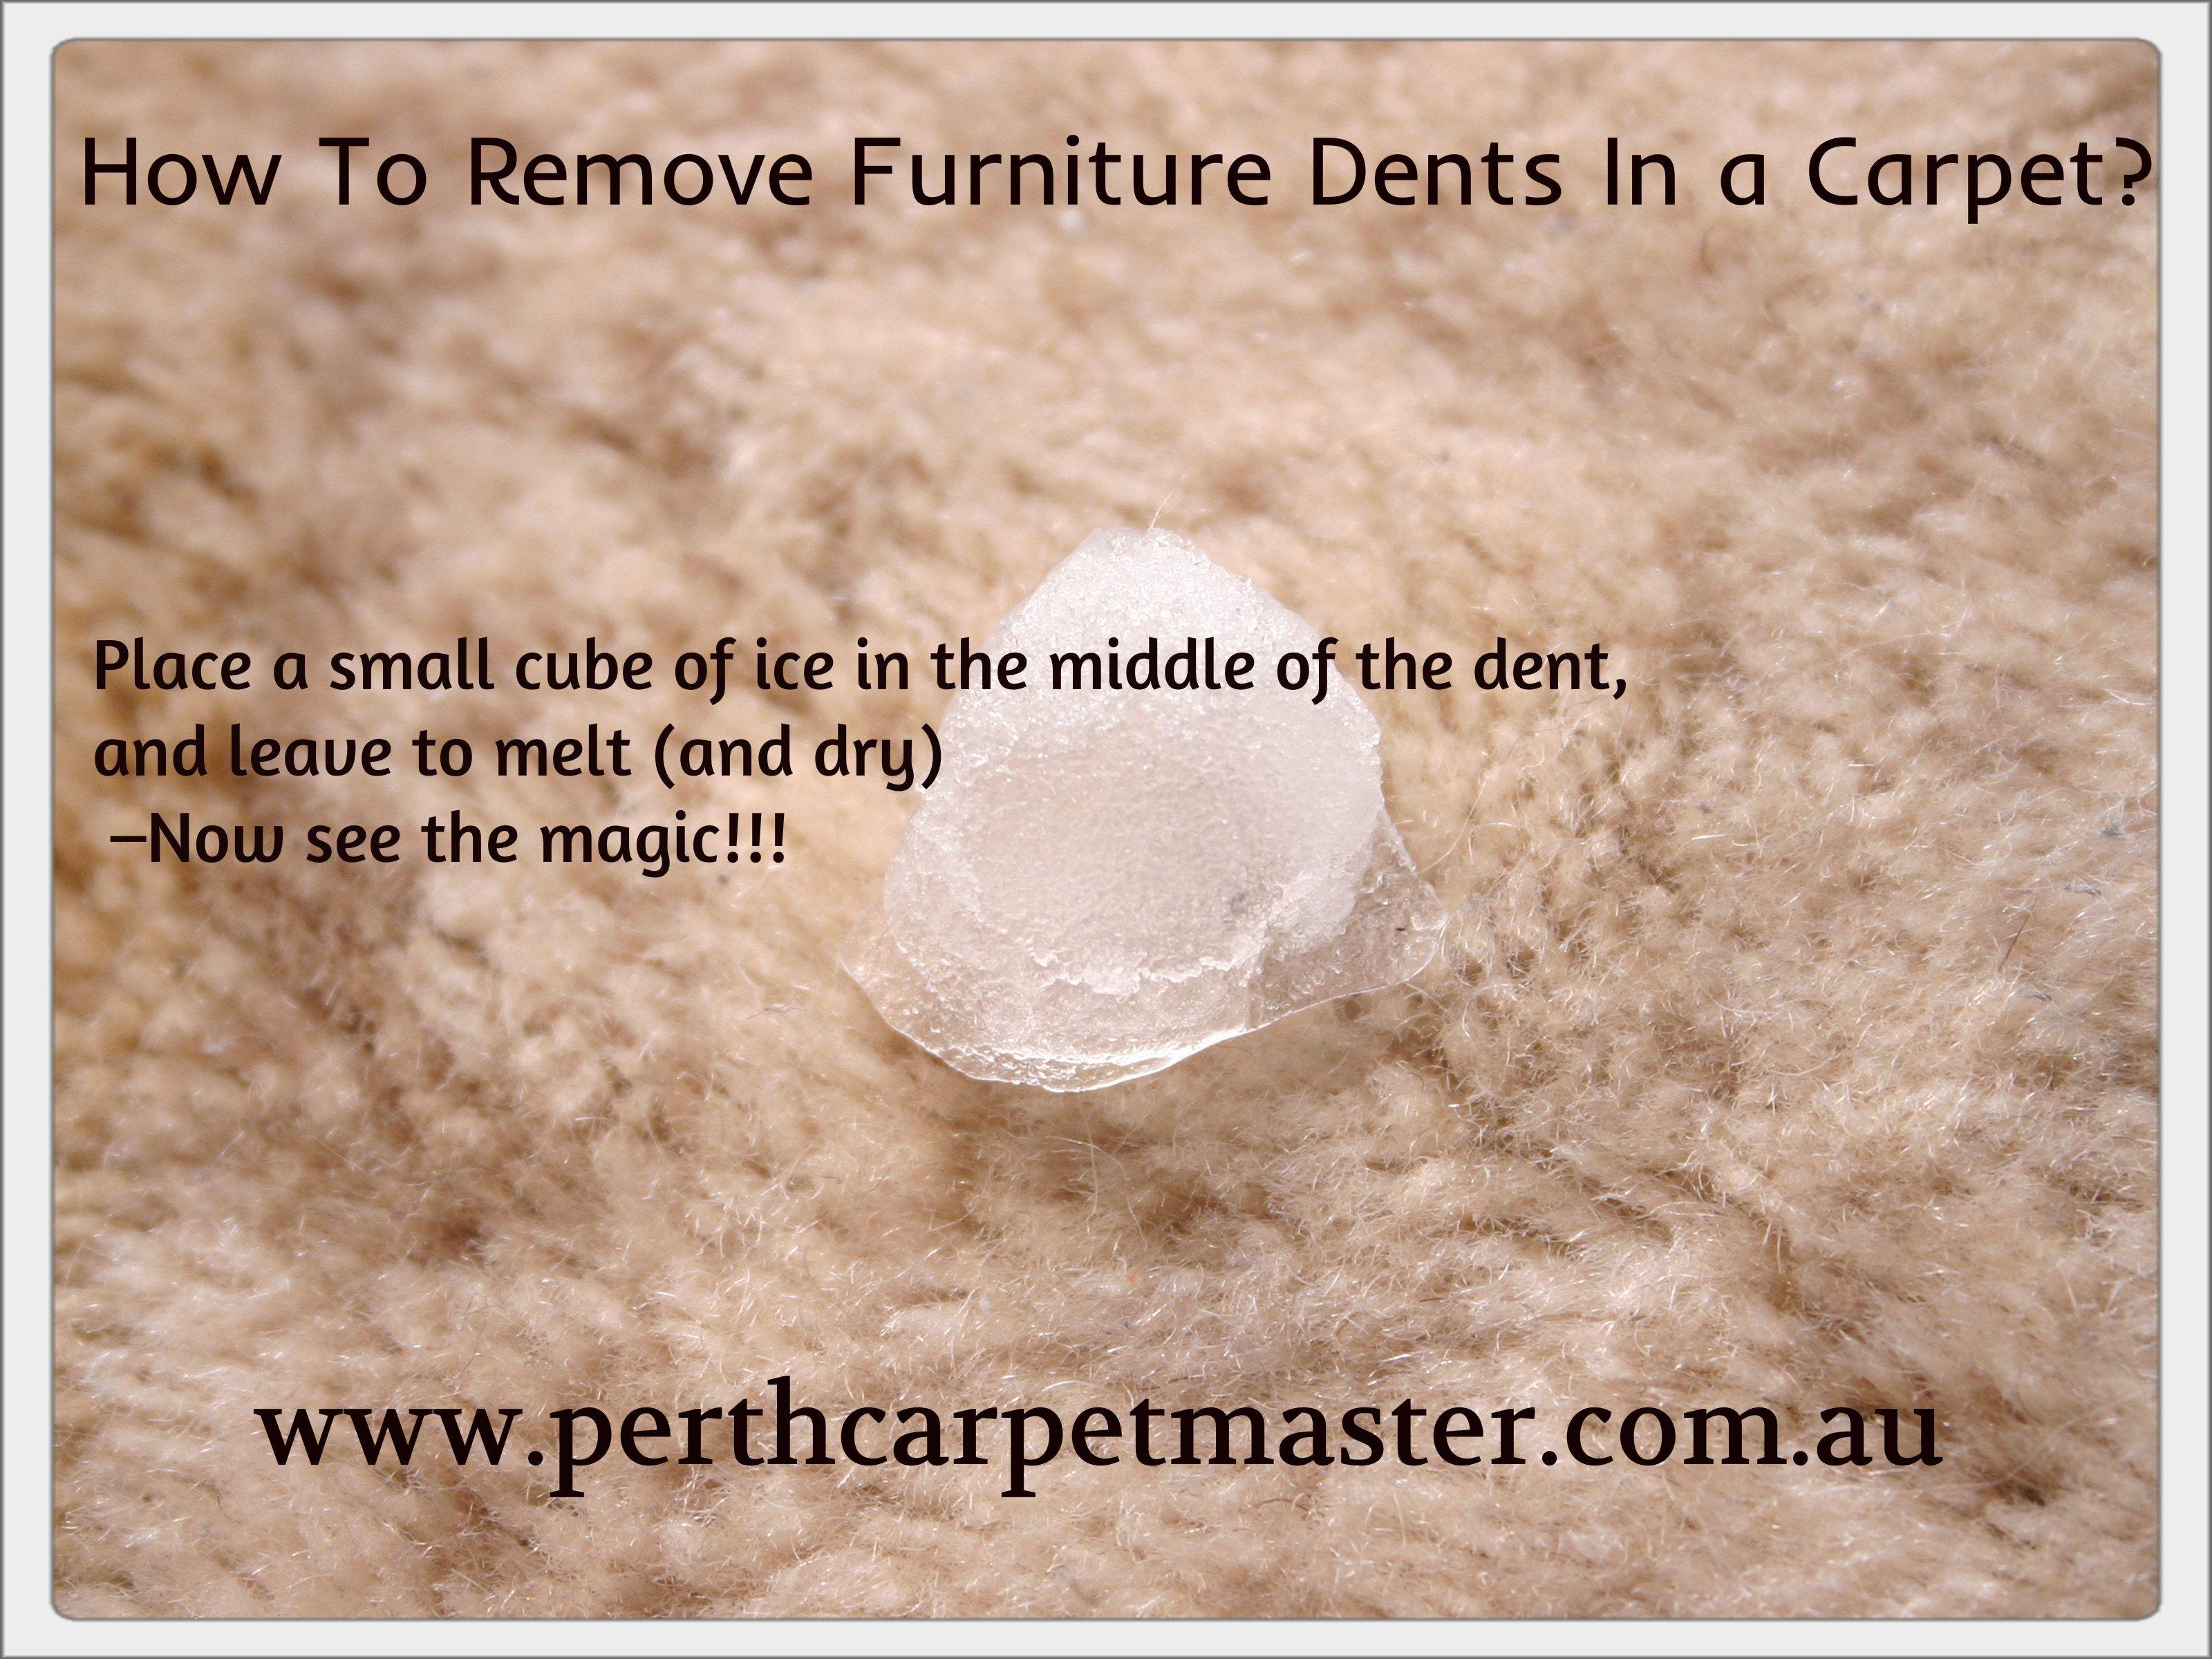 Perth Carpet Repairs And Restoration Services Carpet Repair Carpet Places Carpet